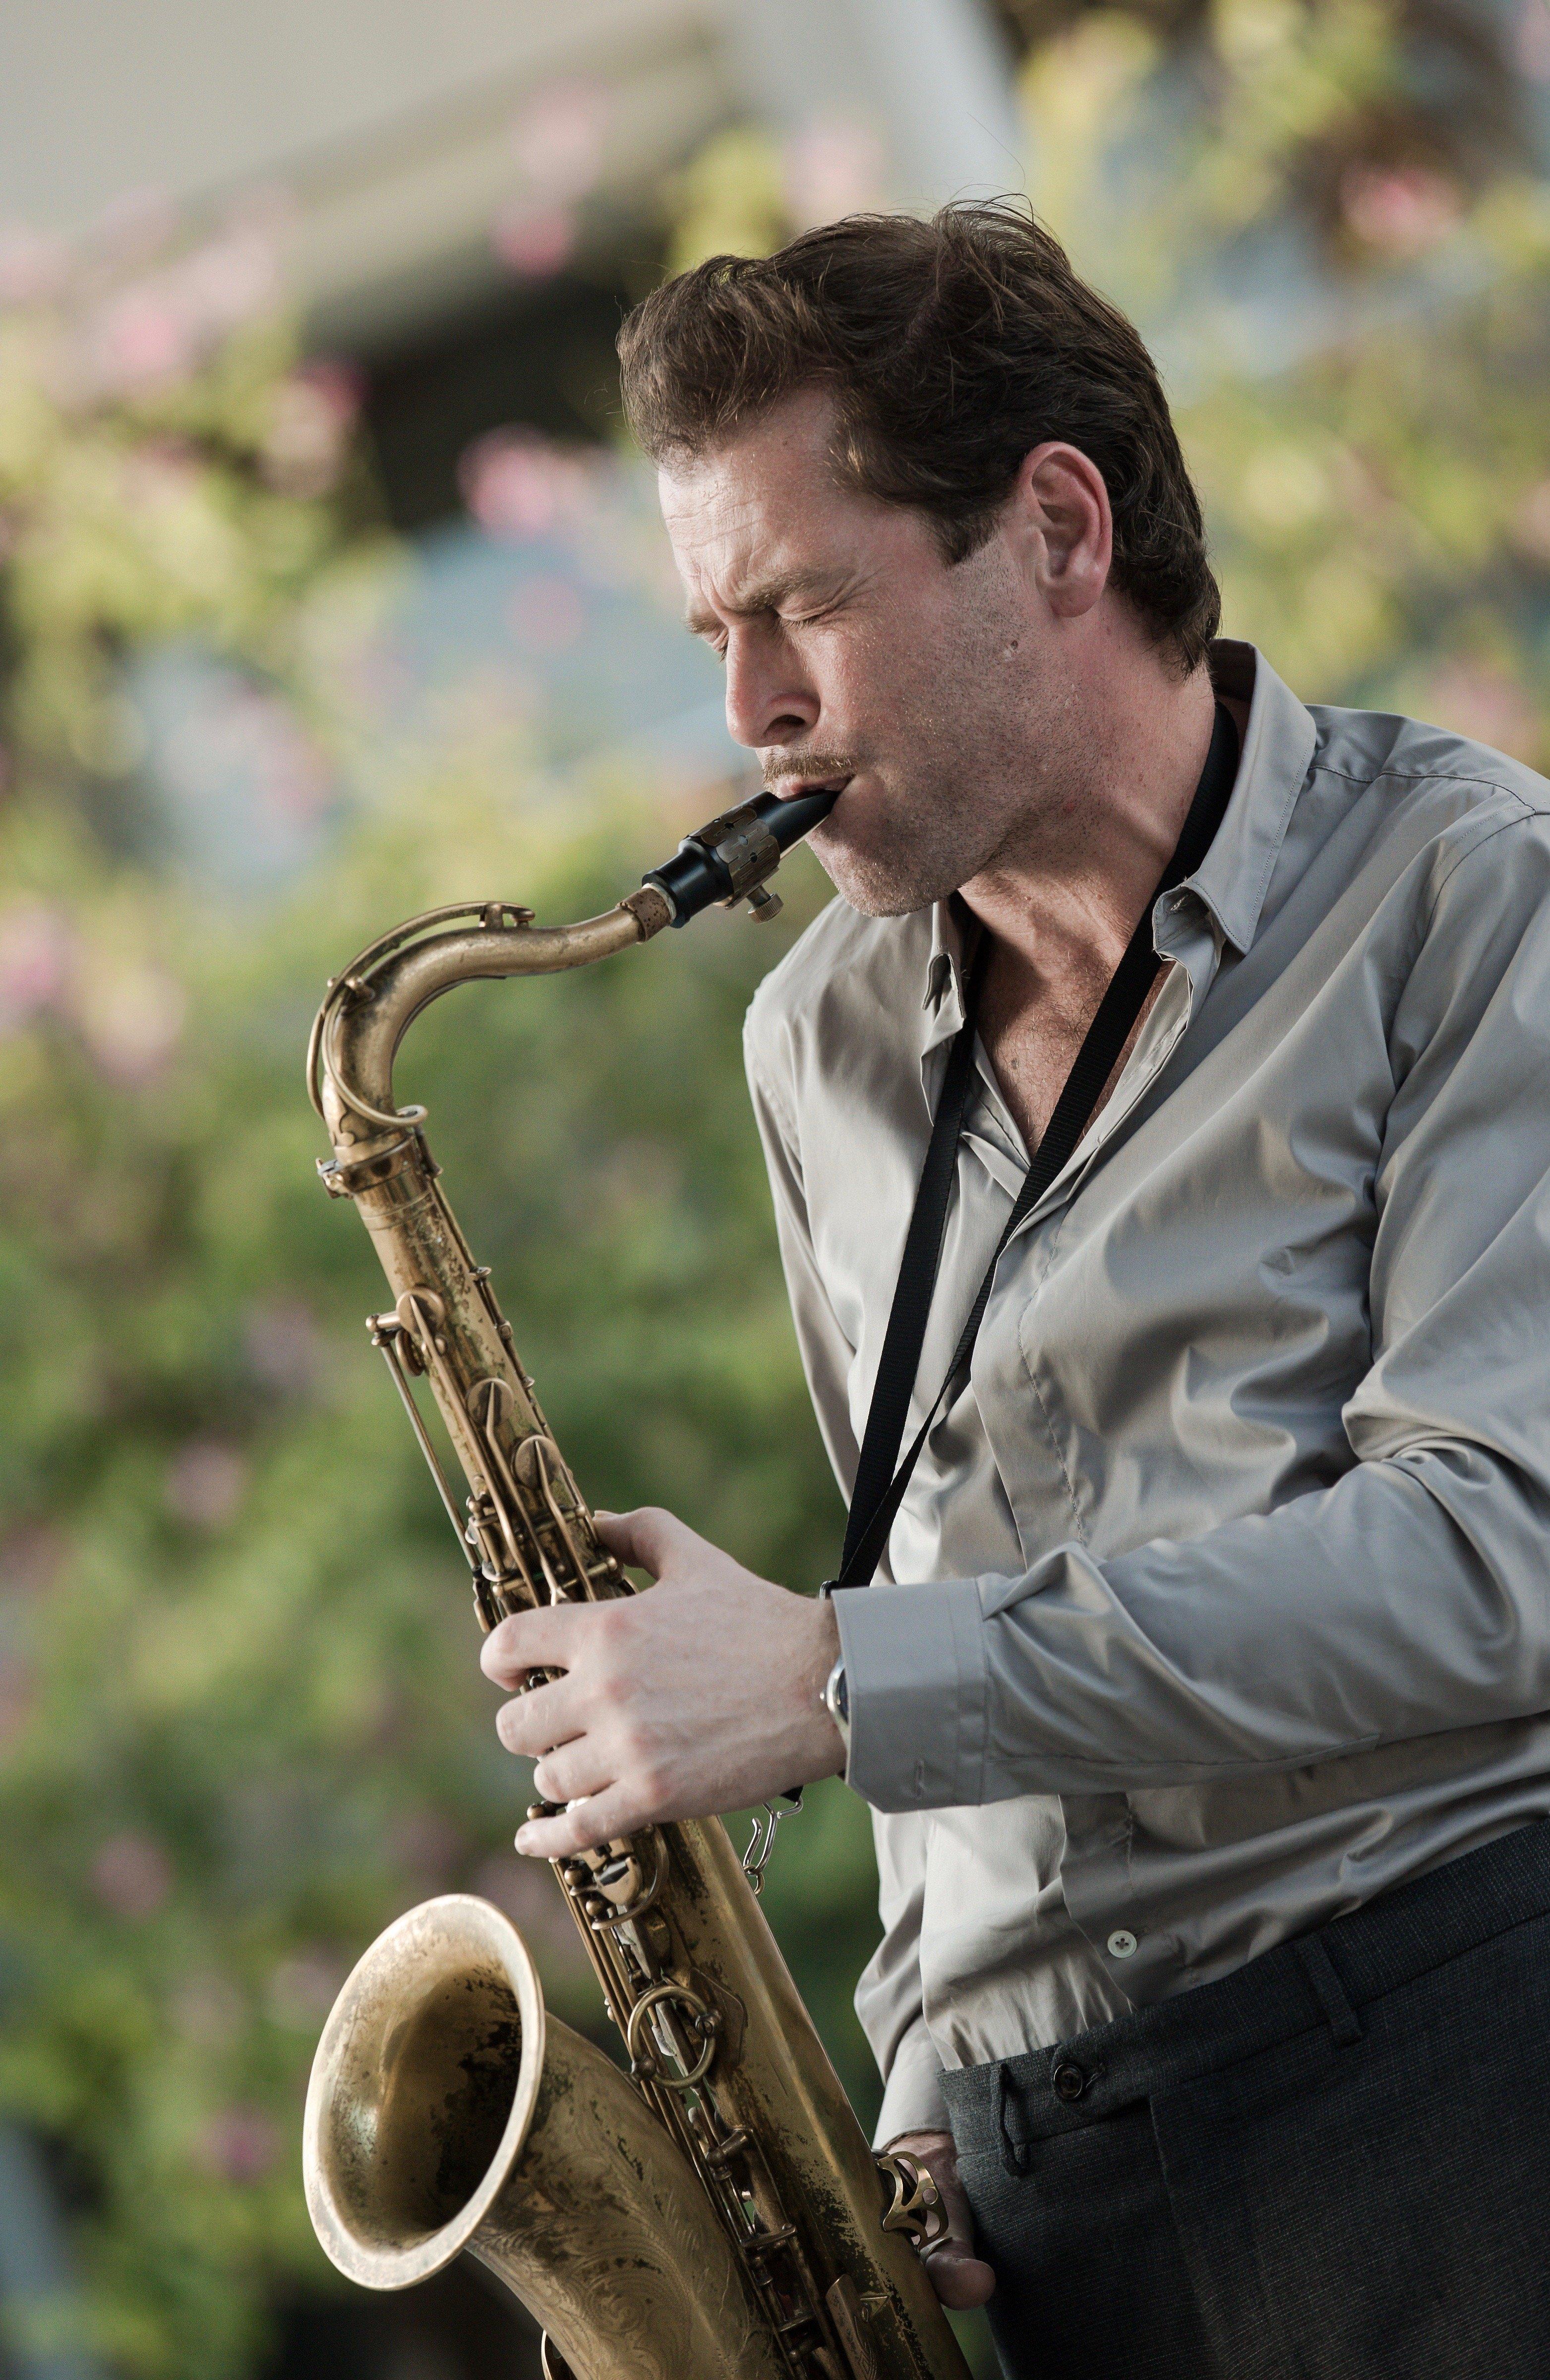 Kevin McMahon - Saxophonist